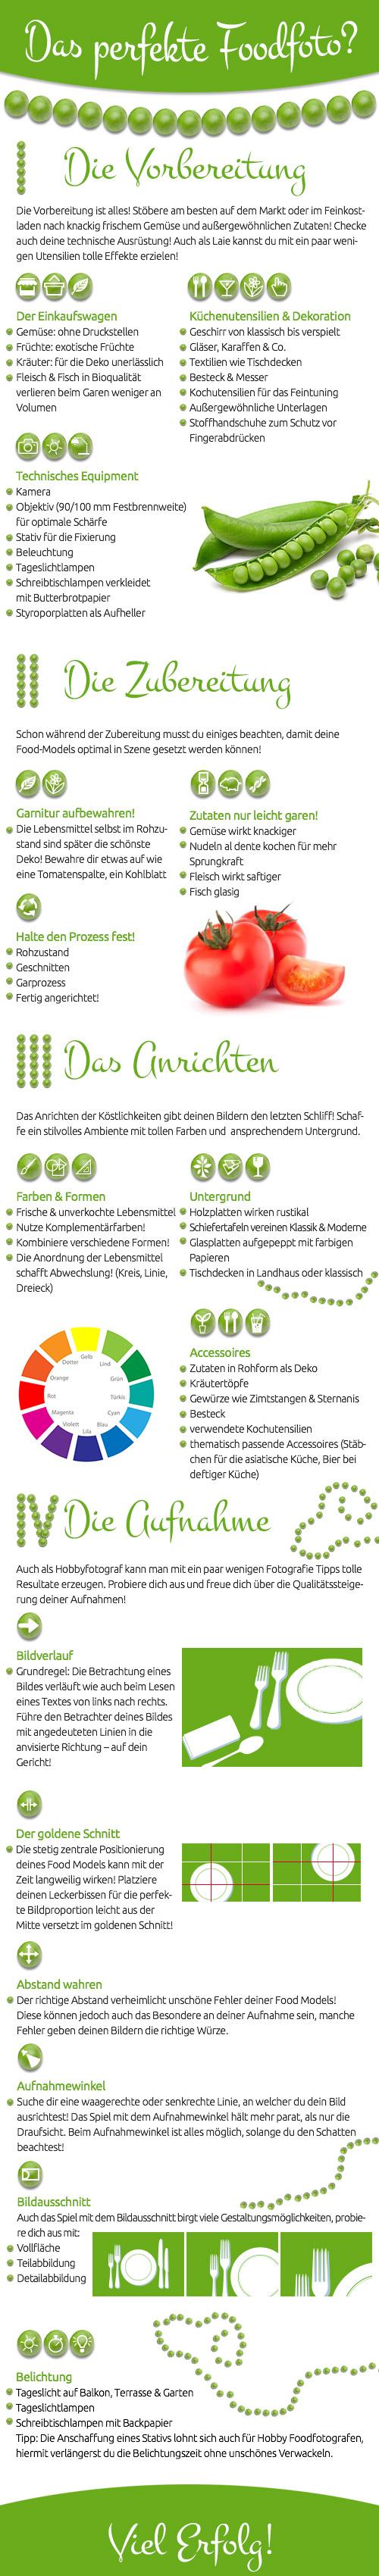 foodfotografie-infografik